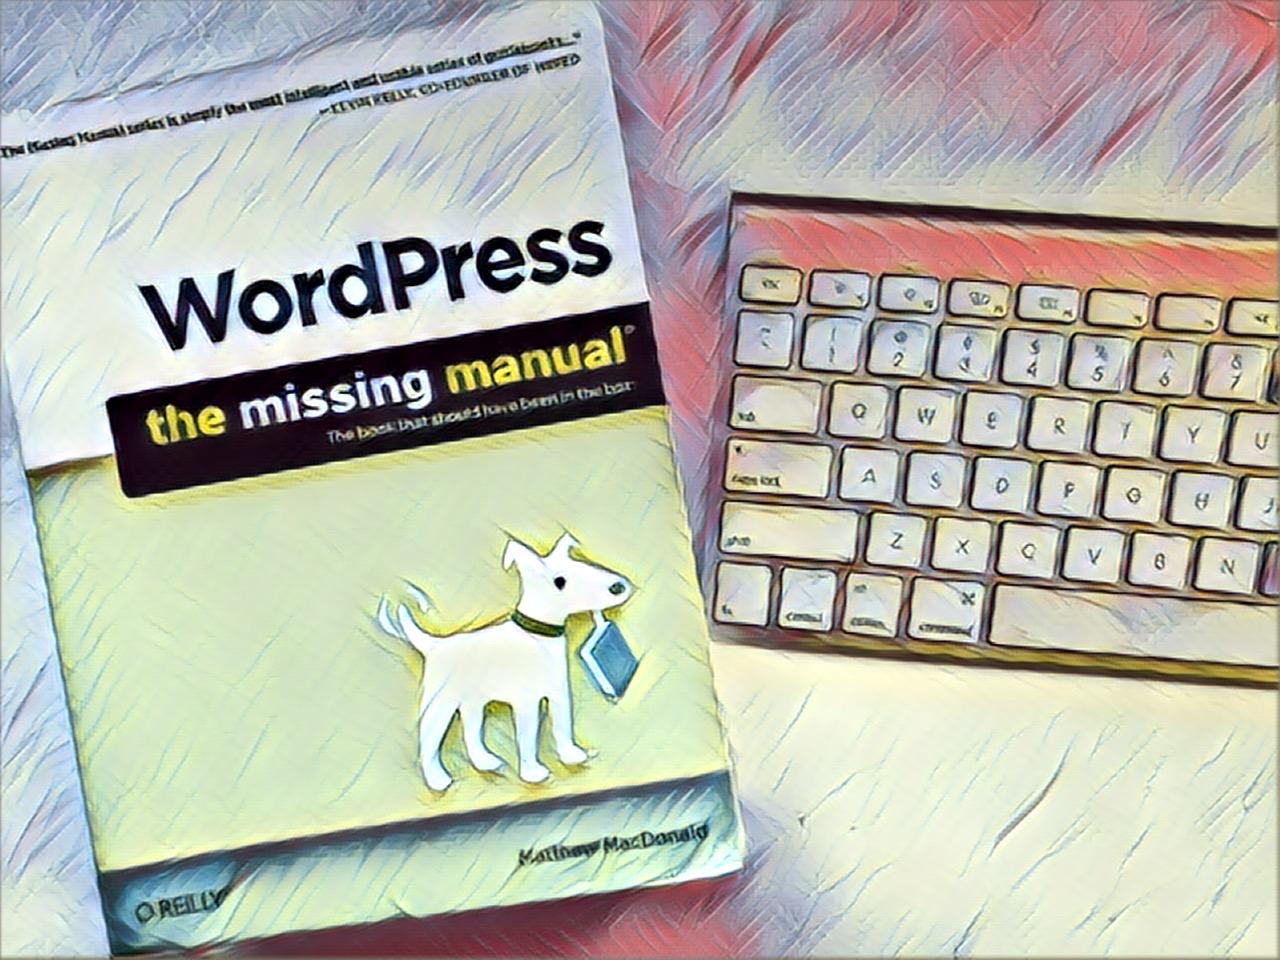 WordPress the Missing Manual sitting on desk next to keyboard